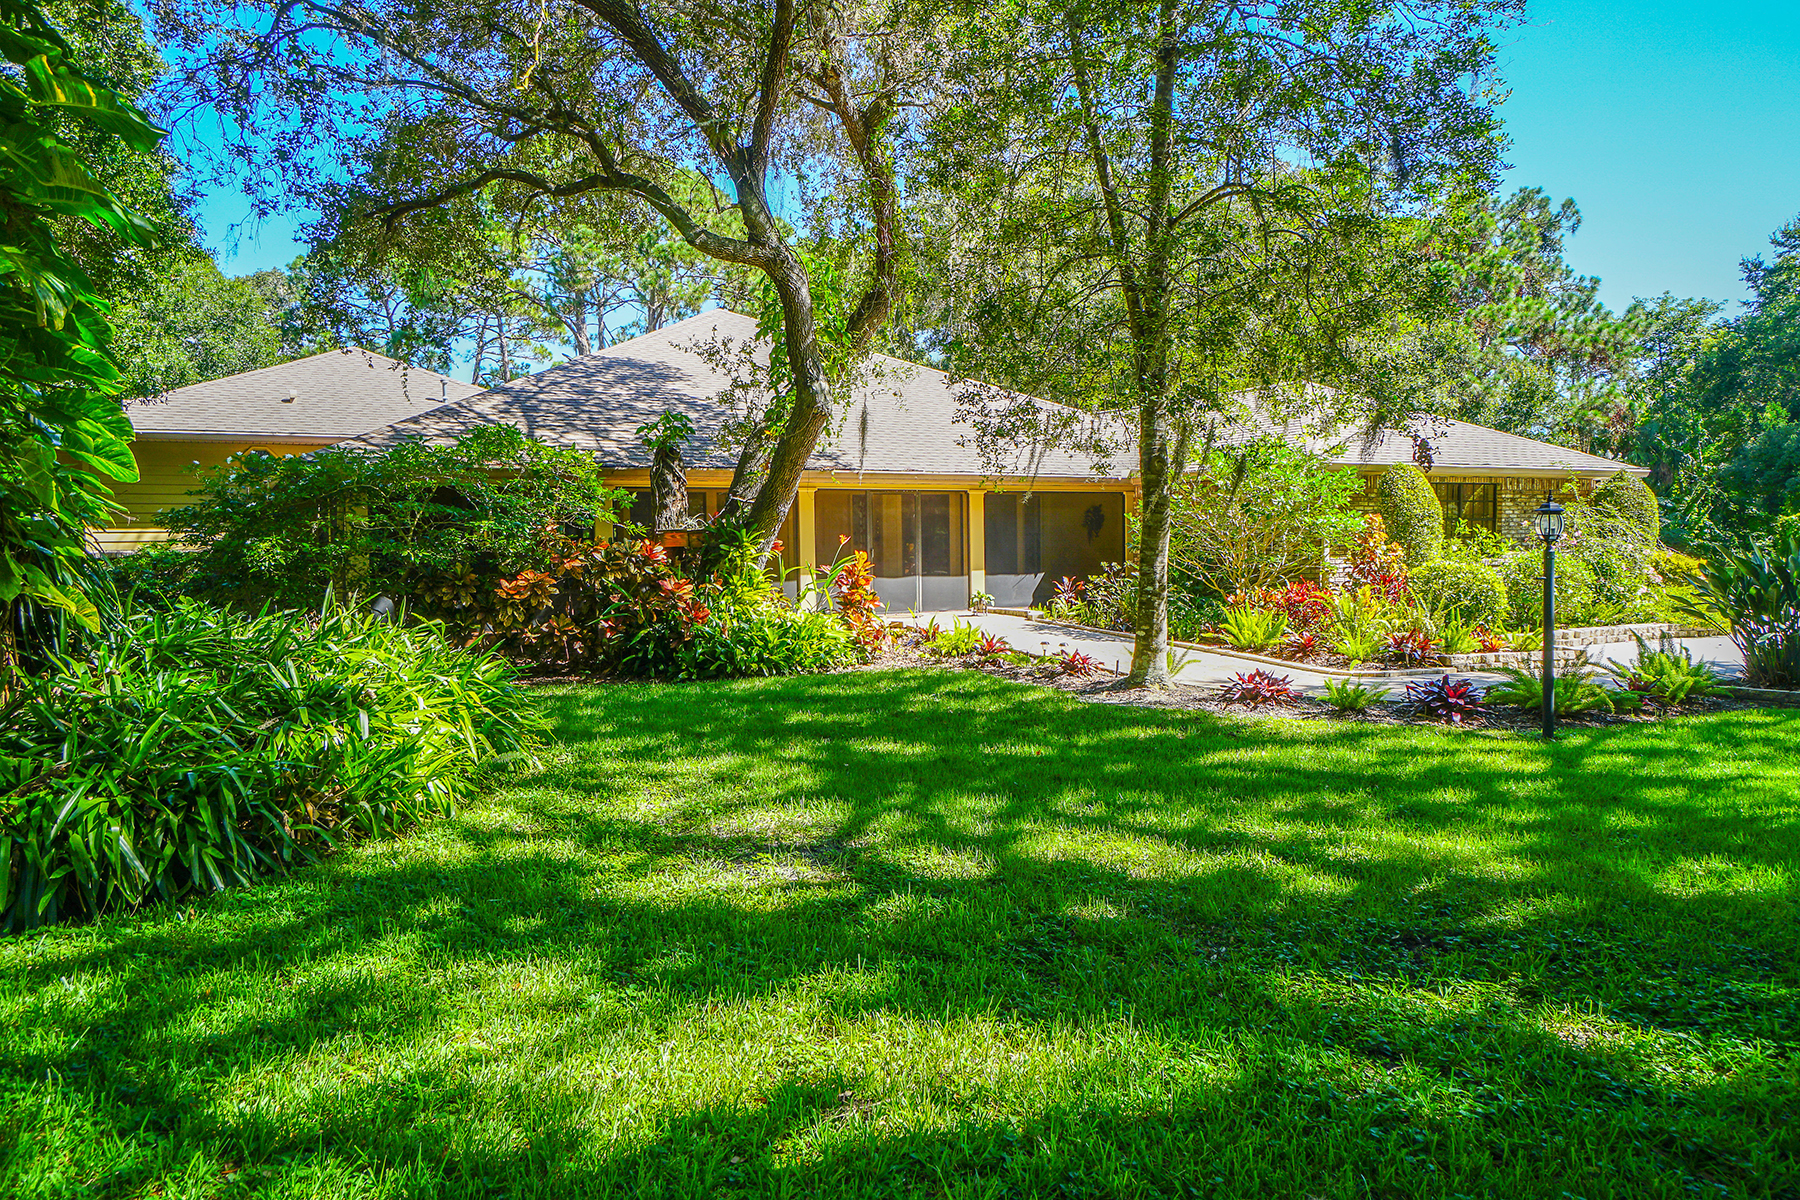 Villa per Vendita alle ore THE MEADOWS 3640 Longmeadow Sarasota, Florida, 34235 Stati Uniti